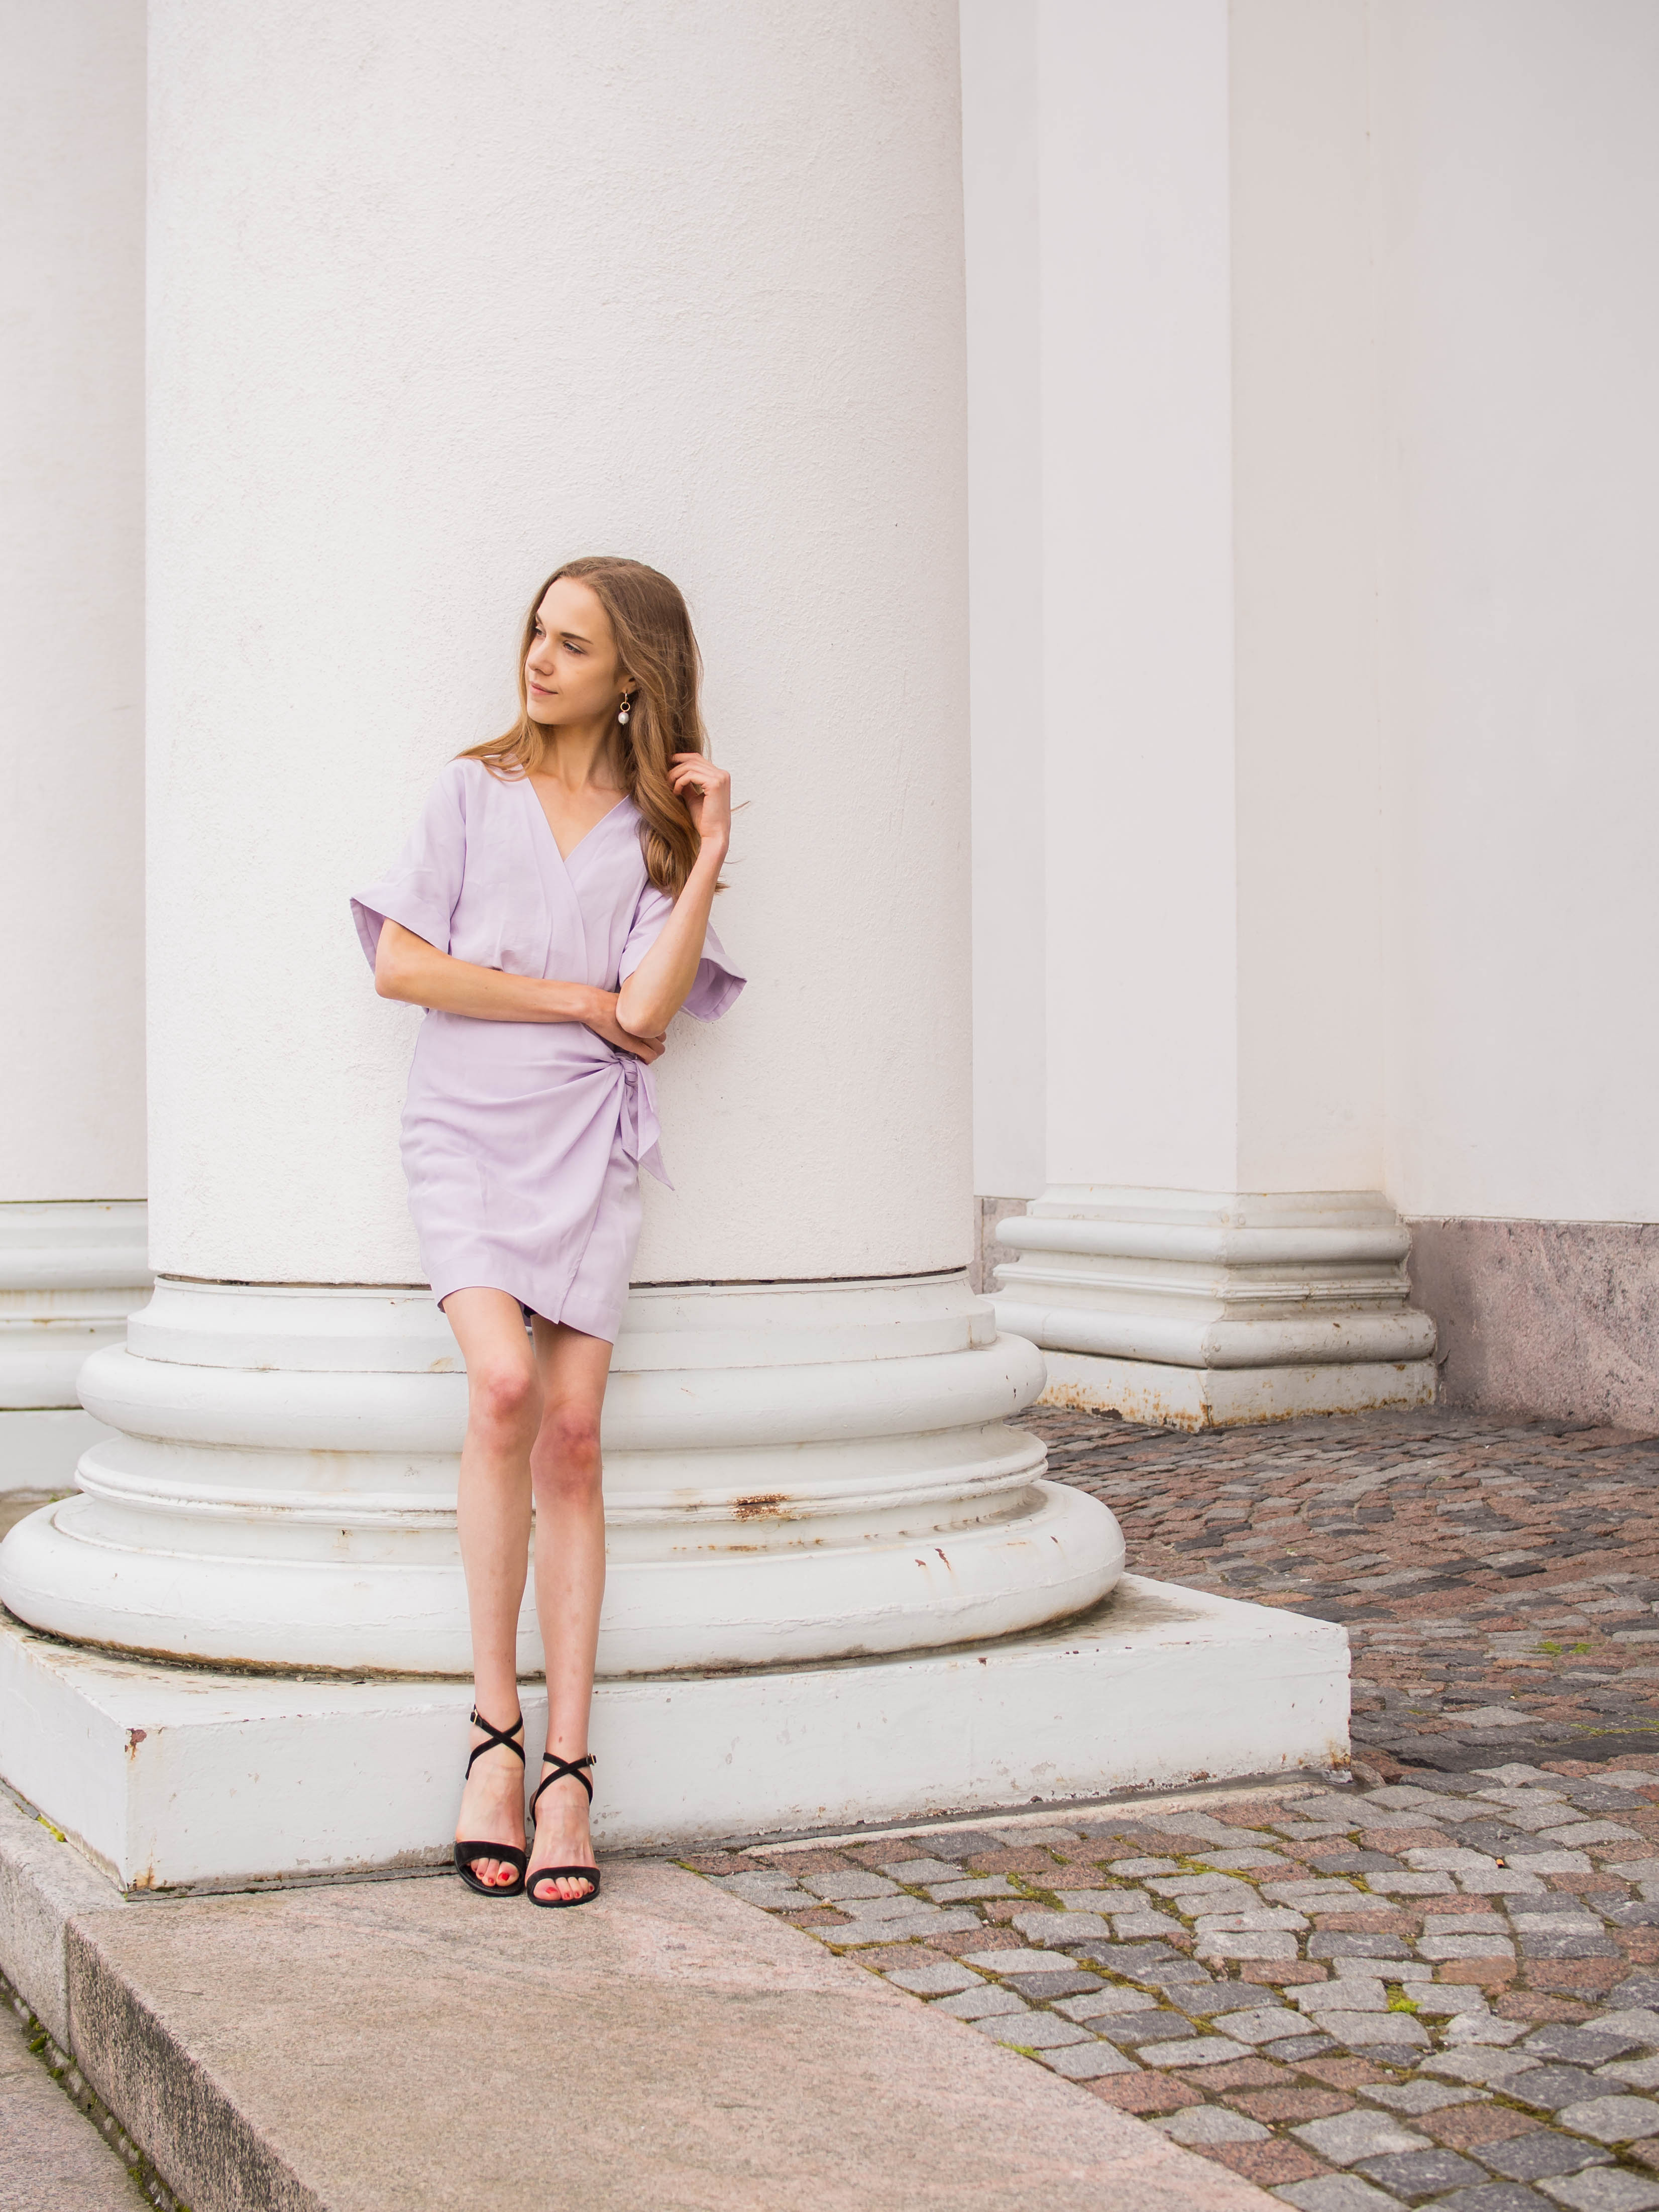 Lilac mini wrap dress from &Other Stories - &Other Stories vaaleanvioletti kietaisumekko